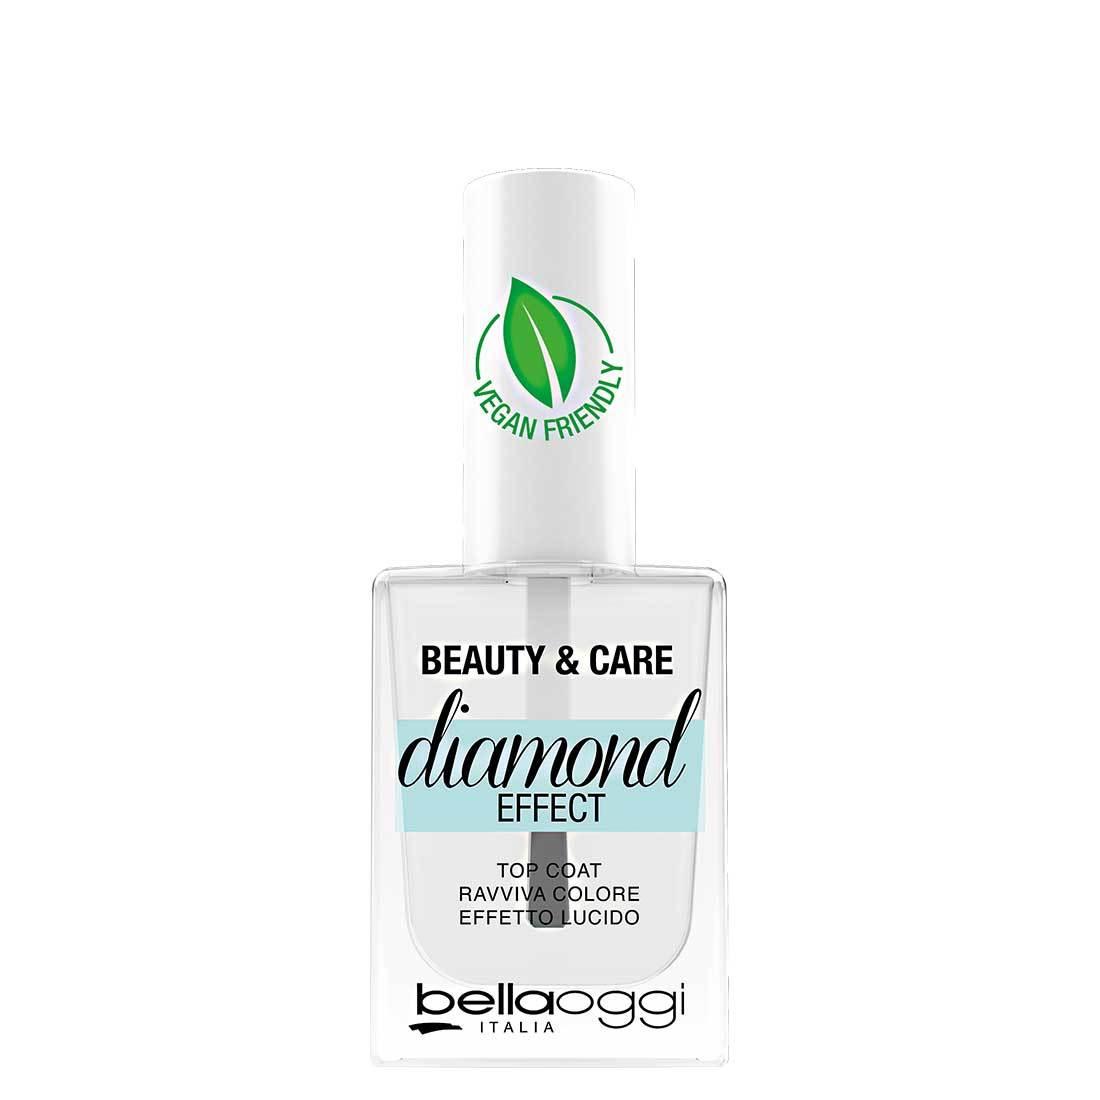 Diamond Effect -Top coat ravviva colore- Bellaoggi